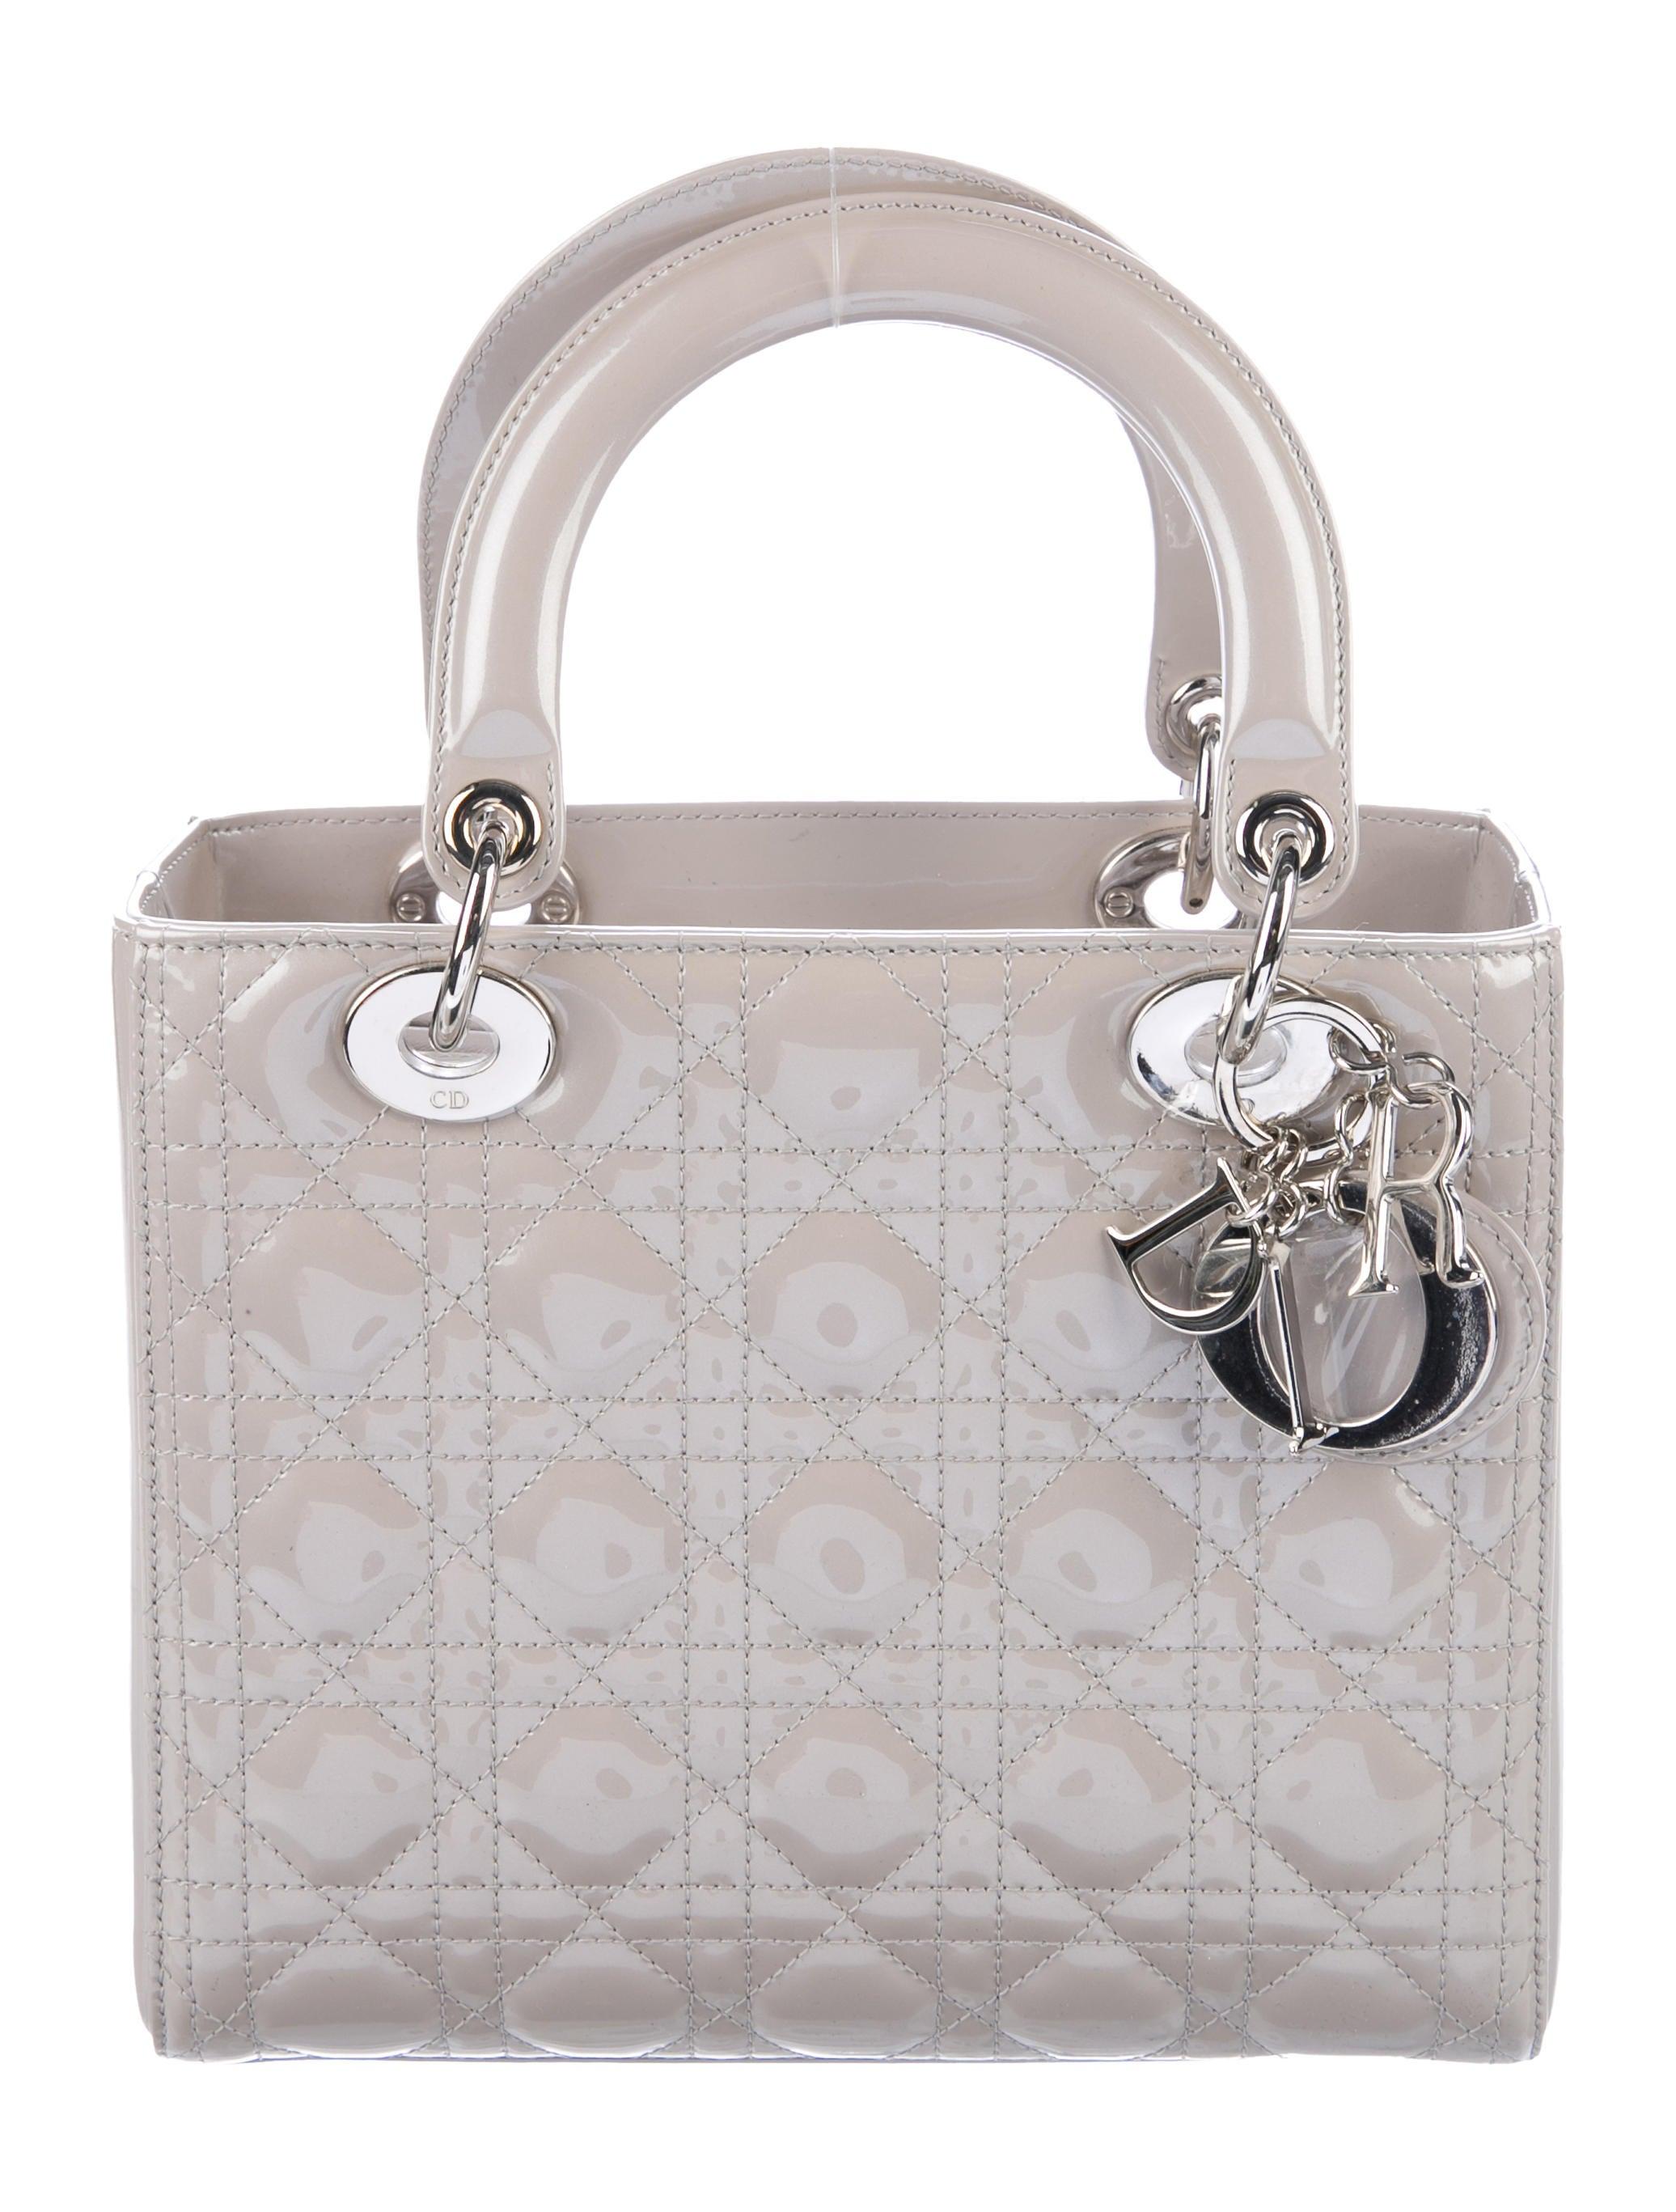 Christian Dior Medium Lady Dior Bag - Handbags - CHR92779  5cf8cdc63ce33